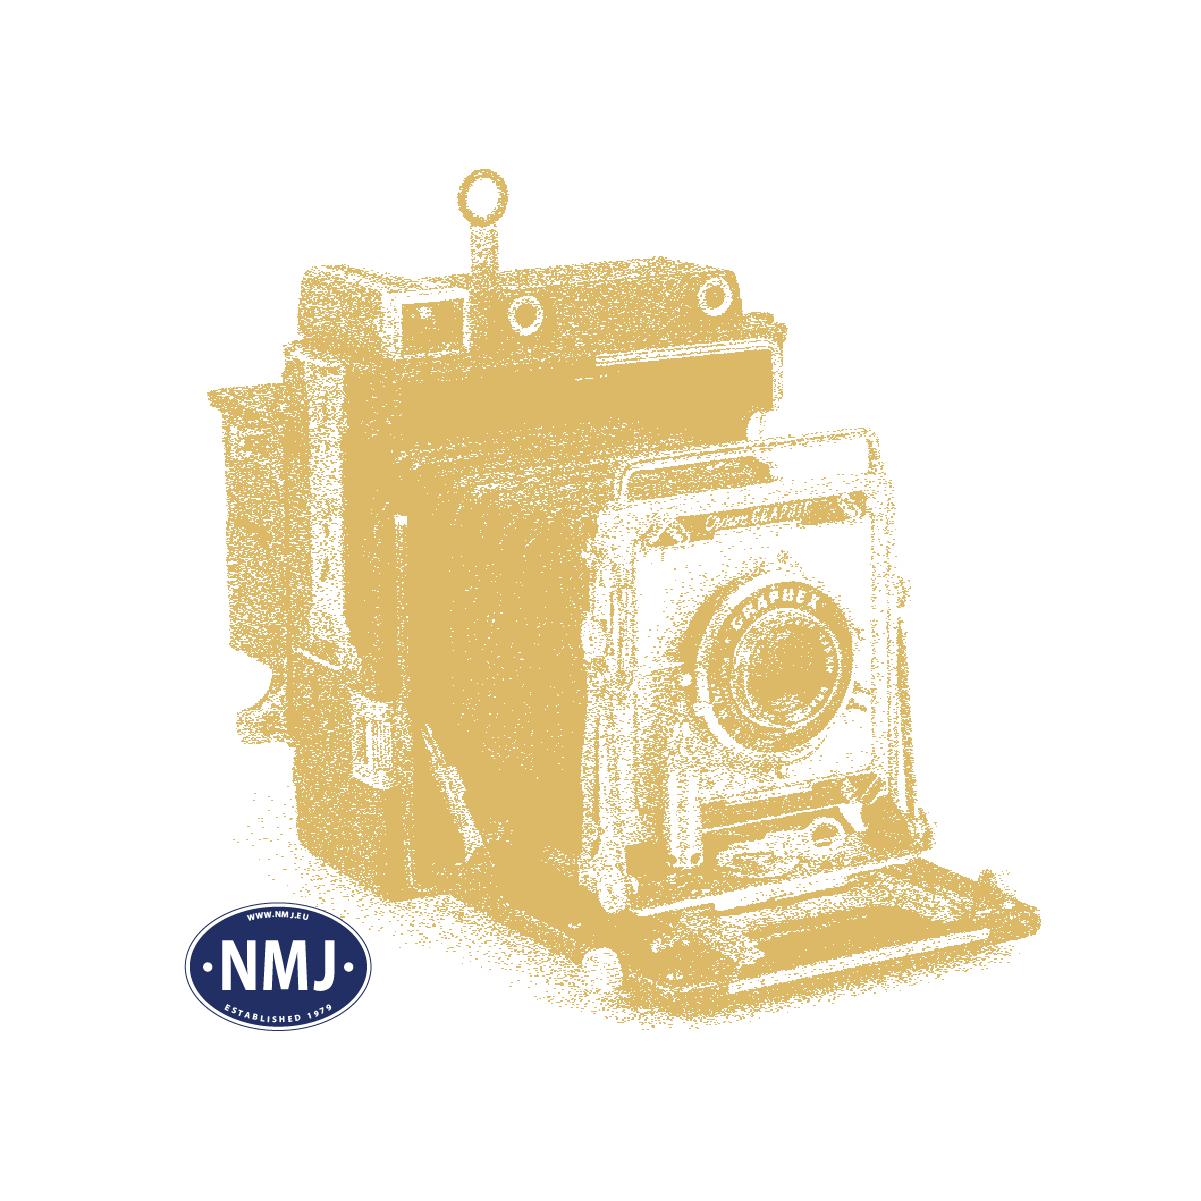 NMJH15108 - NMJ Skyline Modell der Station Strømmen der 70er Jahre, Fertigmodell